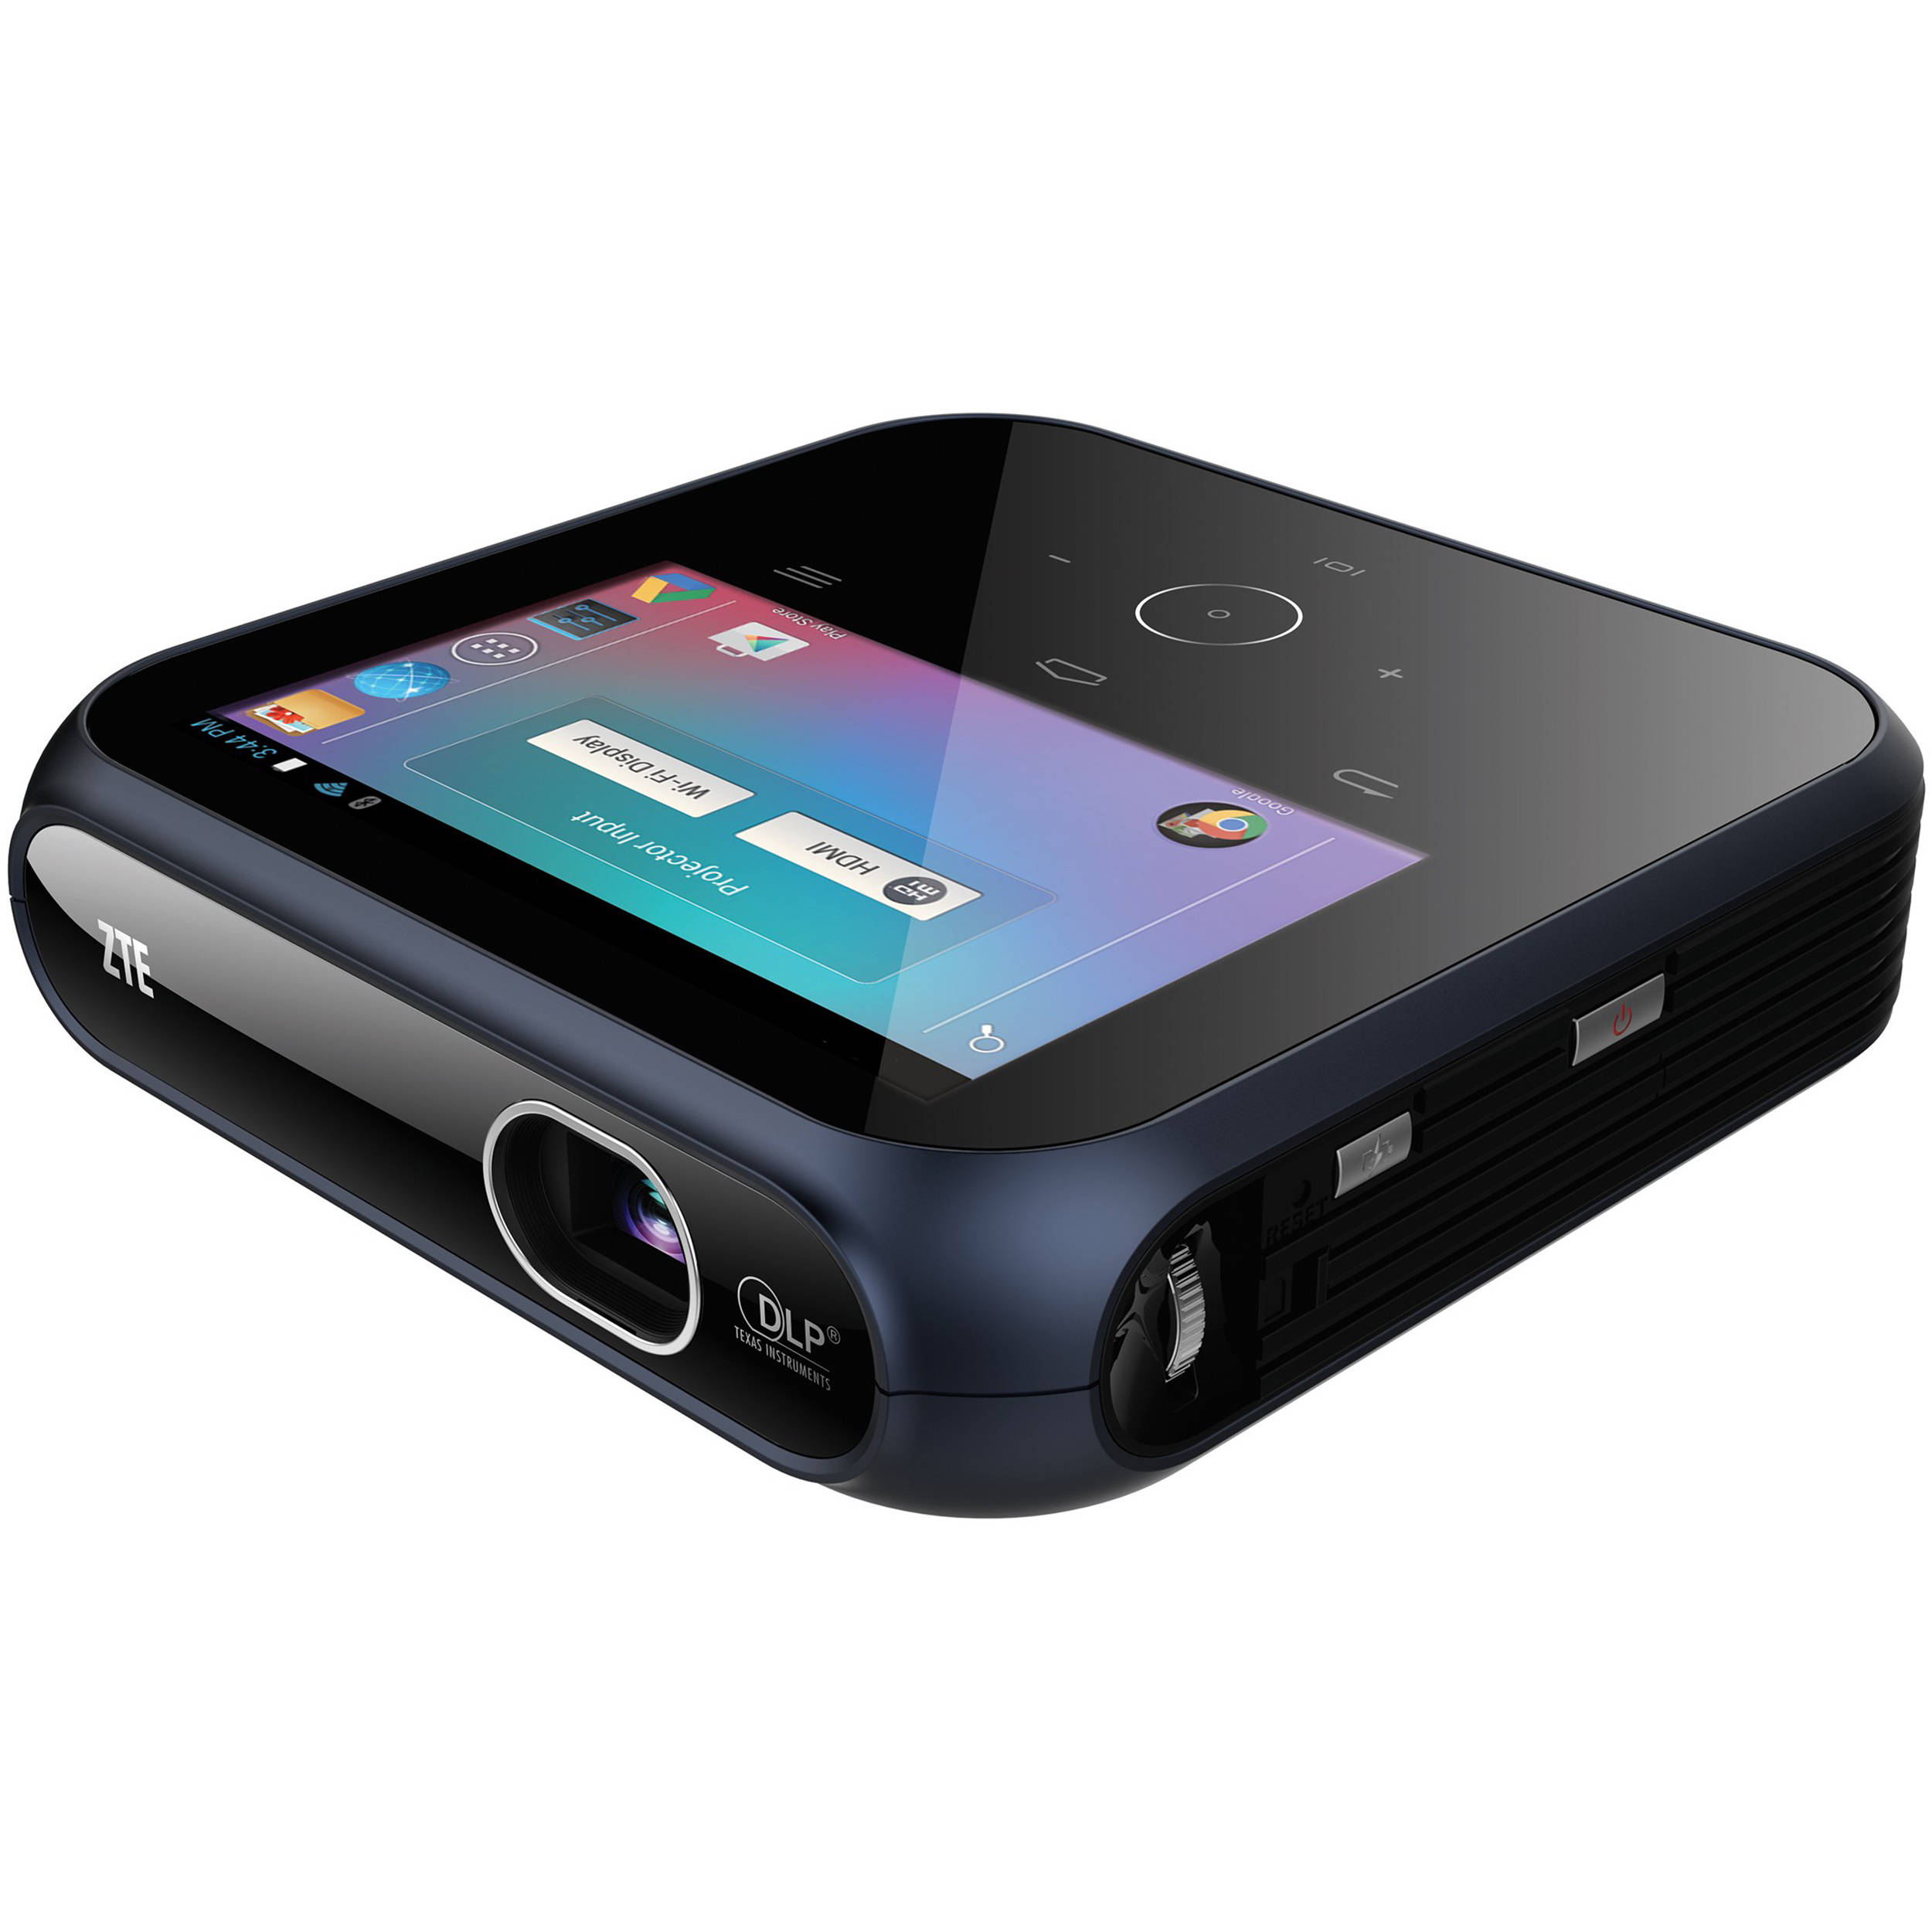 Zte spro mf97w 100 lumen fwvga smart dlp pico projector for Dlp pico projector price